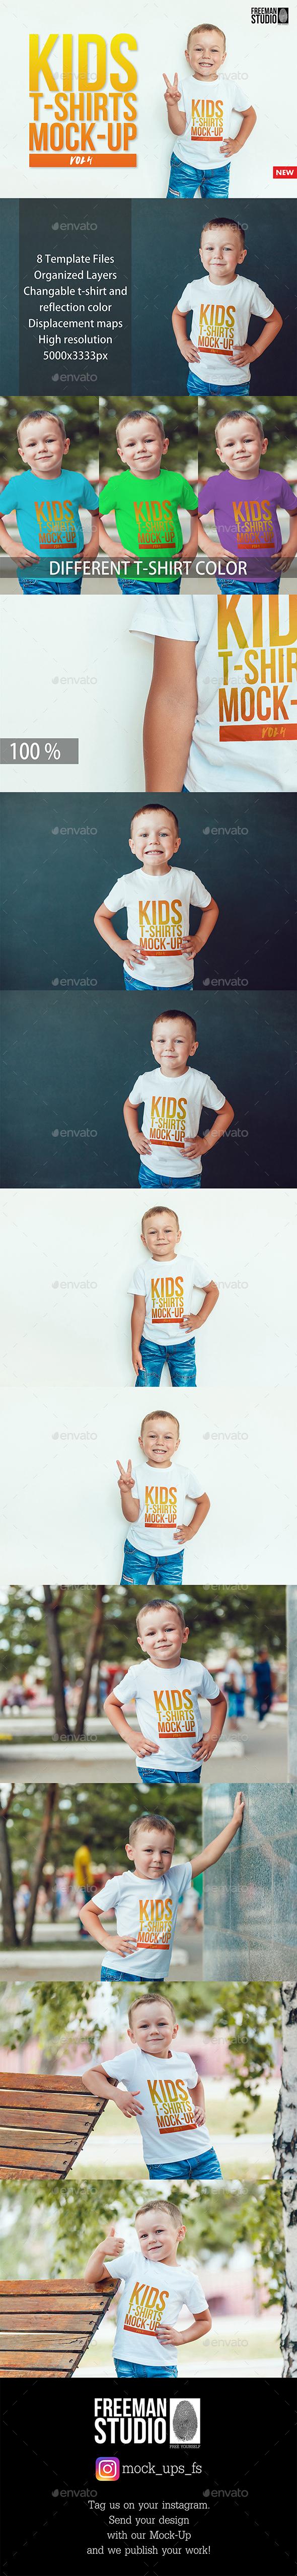 Kids T-Shirt Mock-Up - Product Mock-Ups Graphics